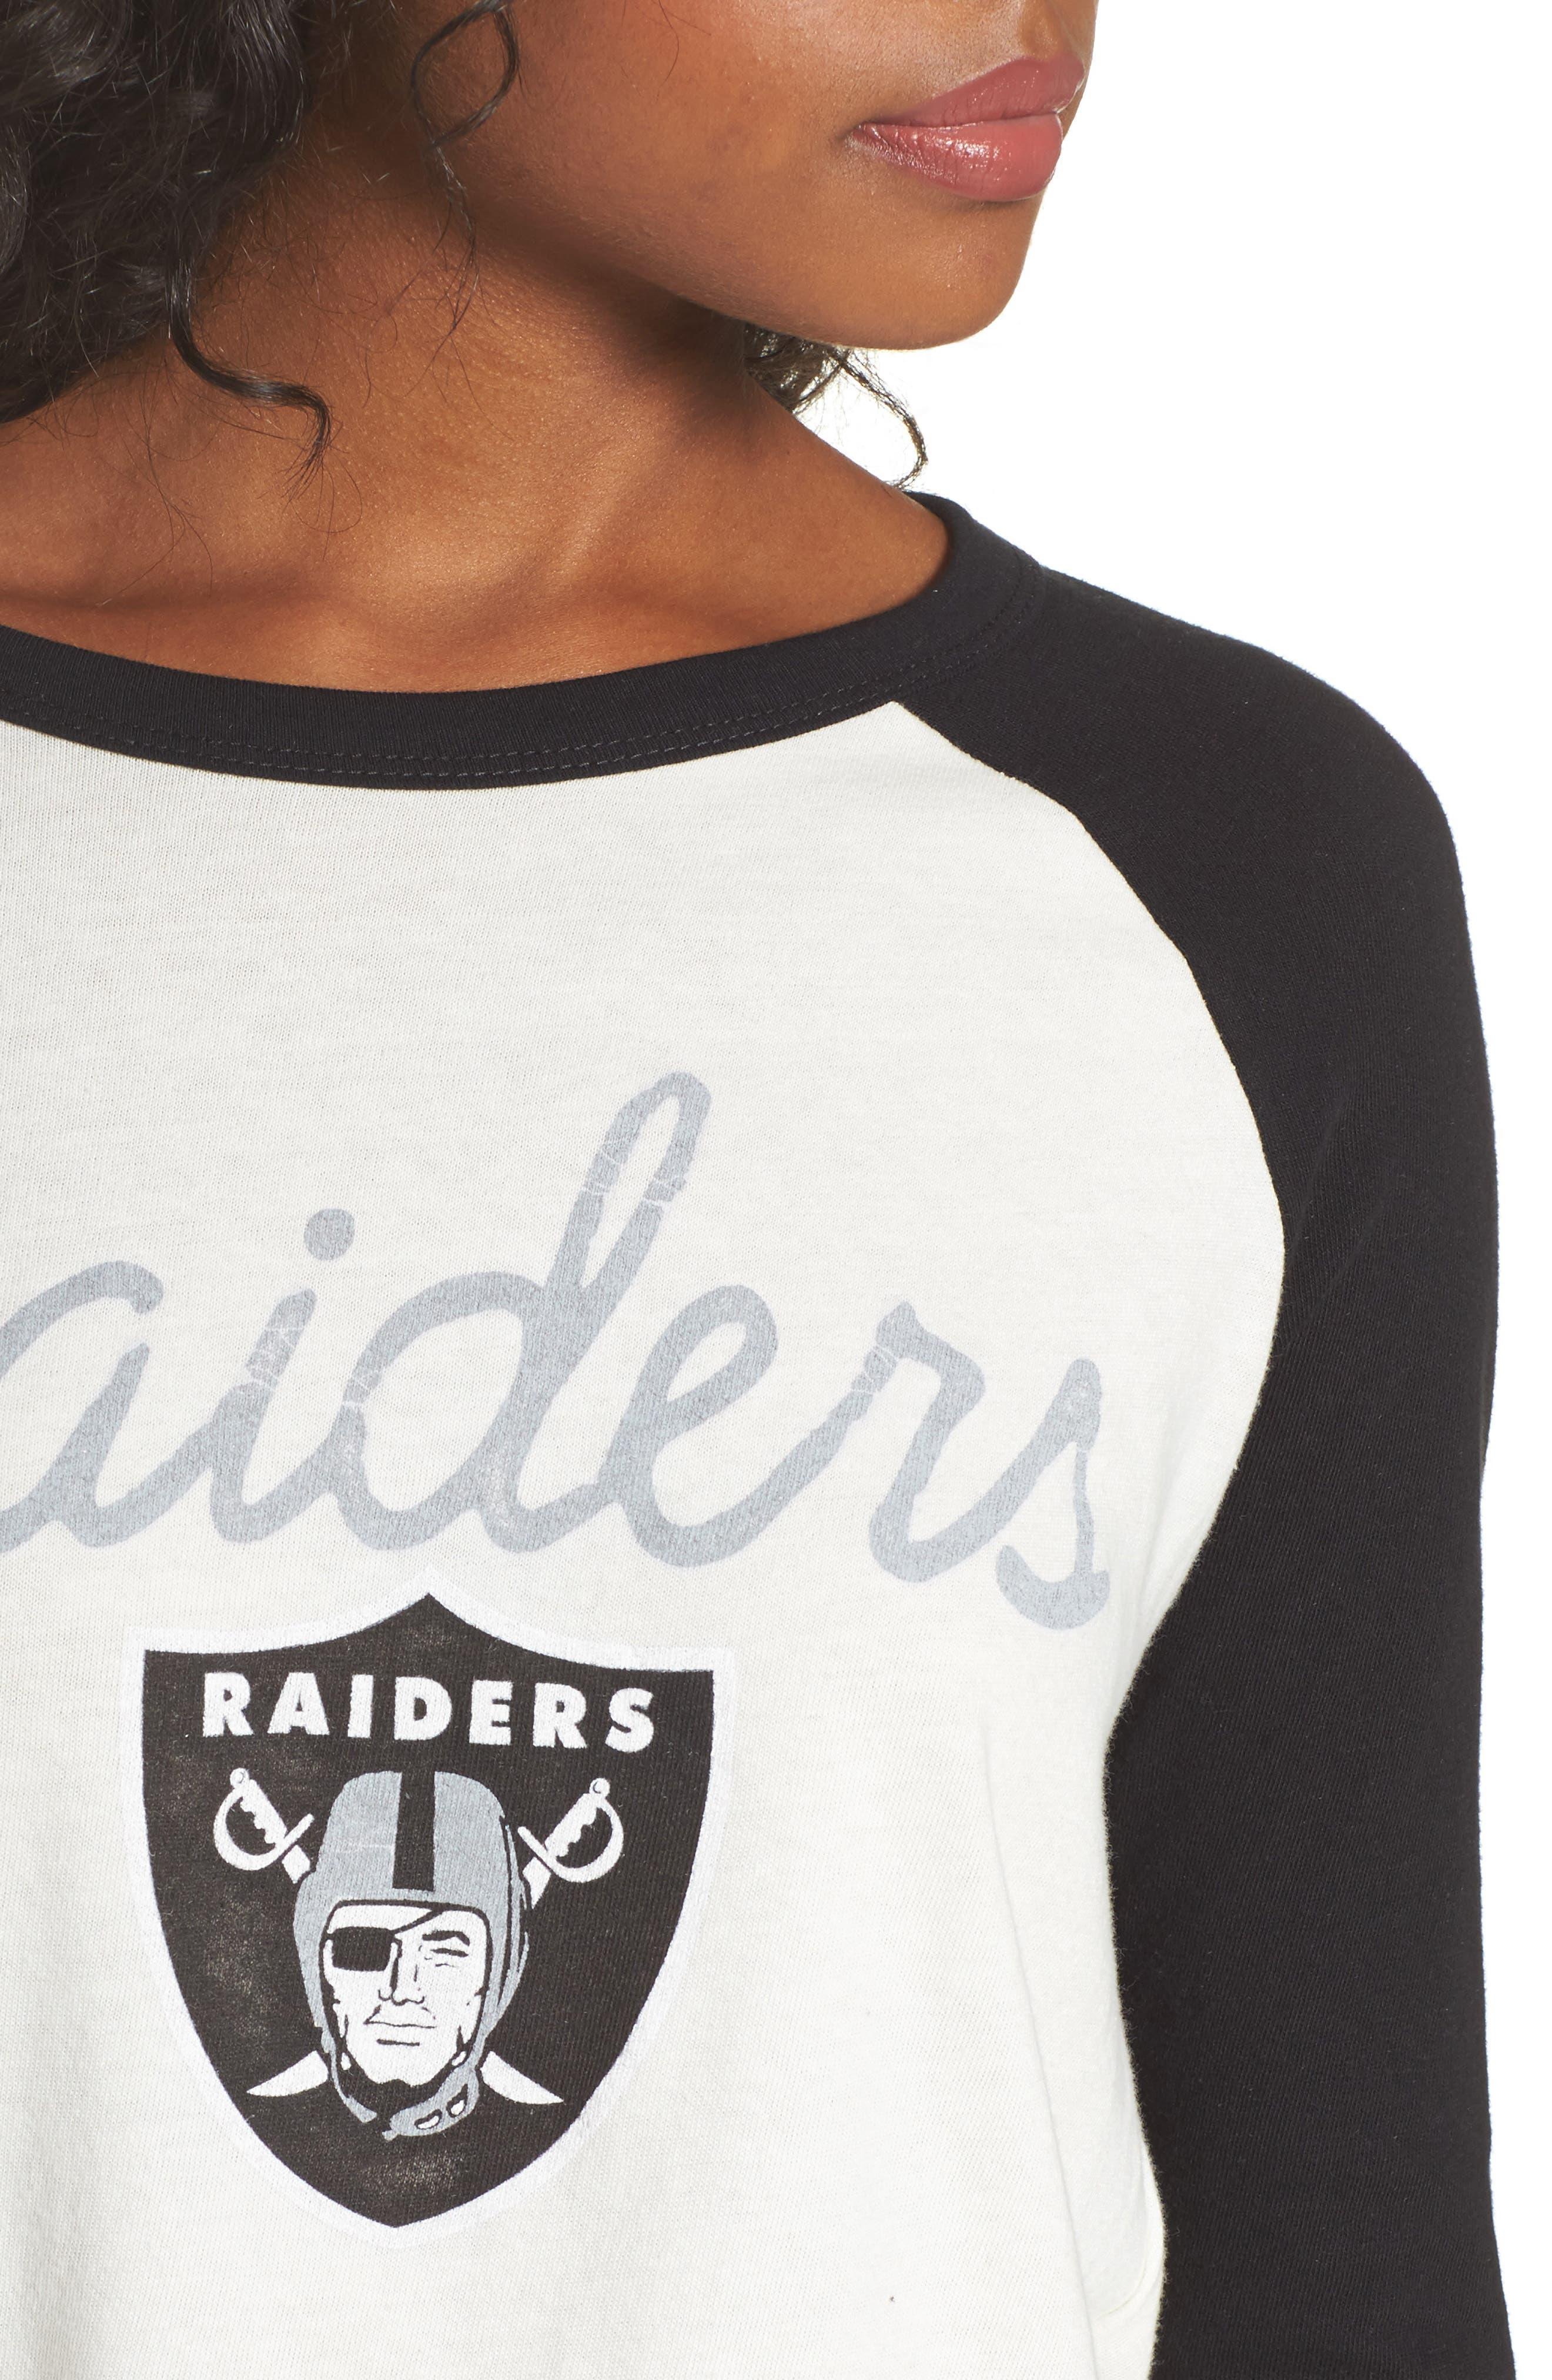 NFL Oakland Raiders Raglan Tee,                             Alternate thumbnail 4, color,                             Sugar/ True Black